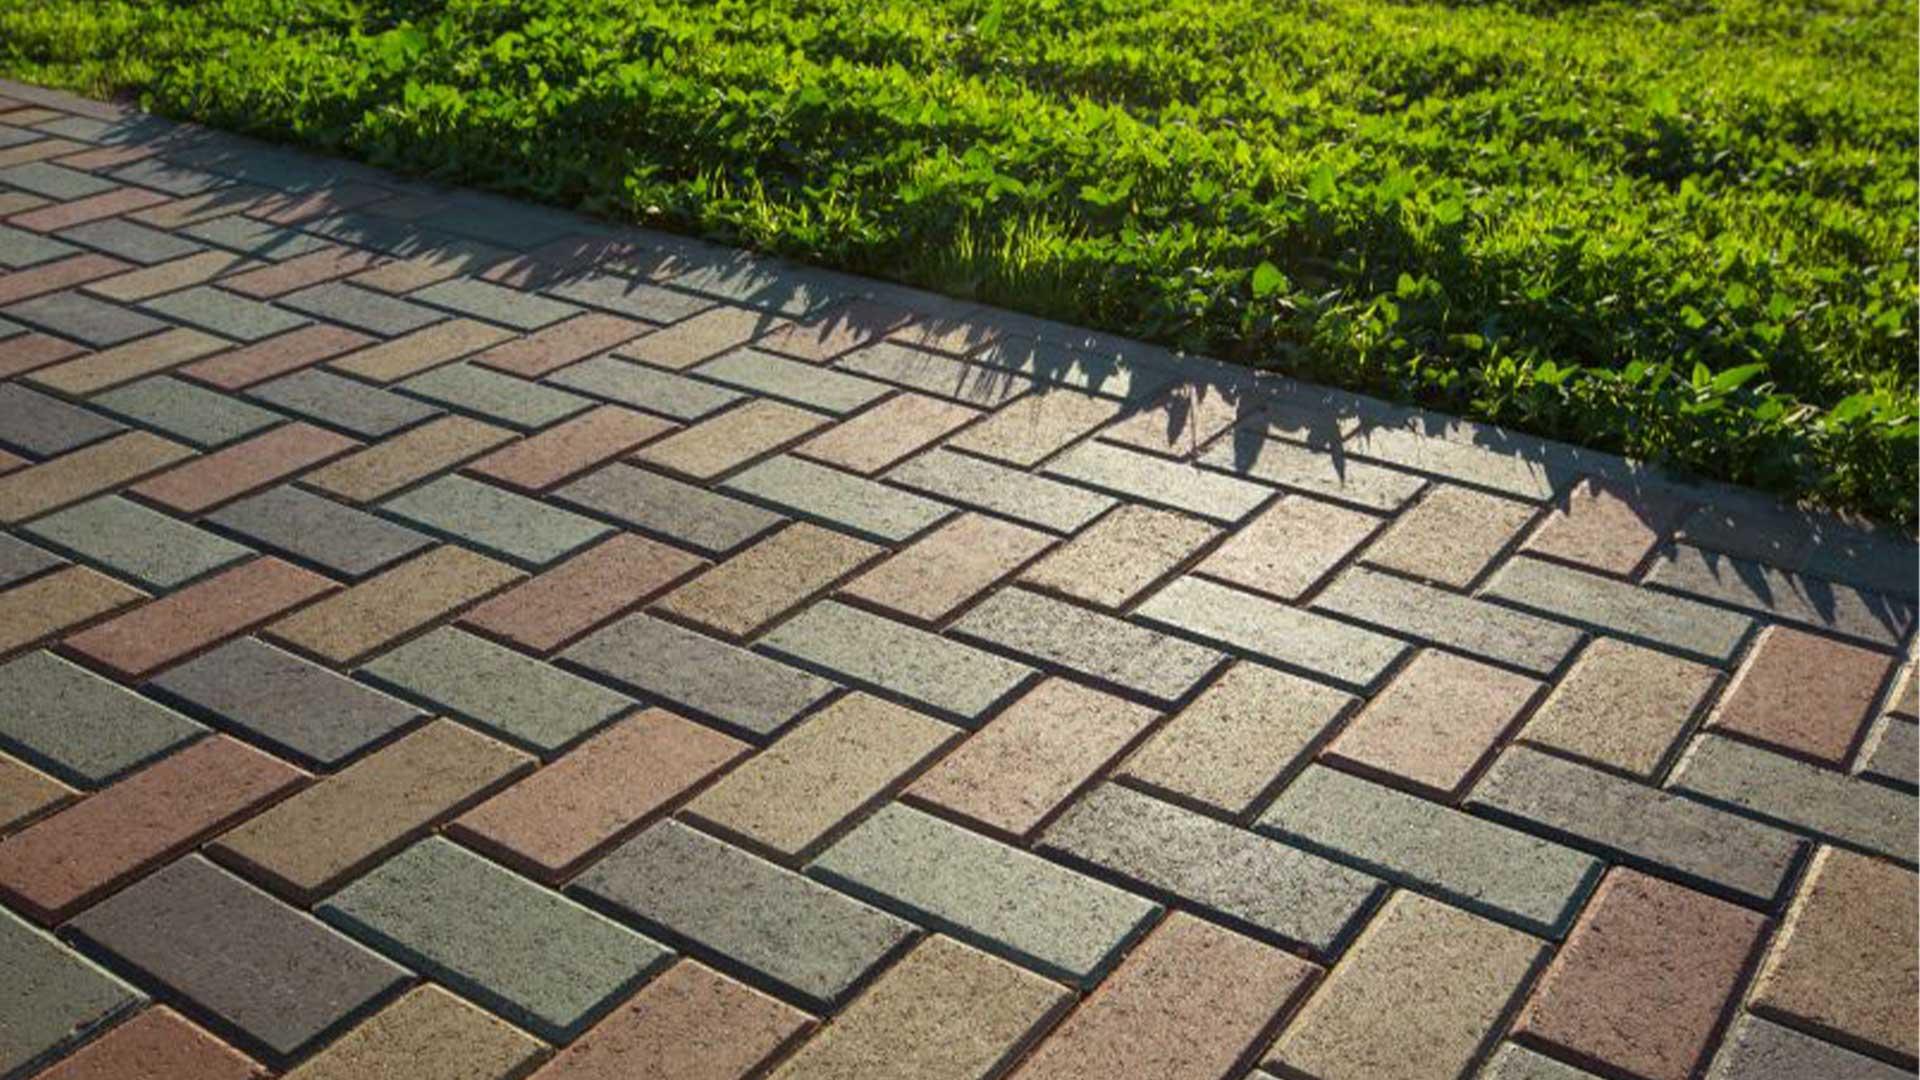 close-up-of-driveway-pavers.jpg